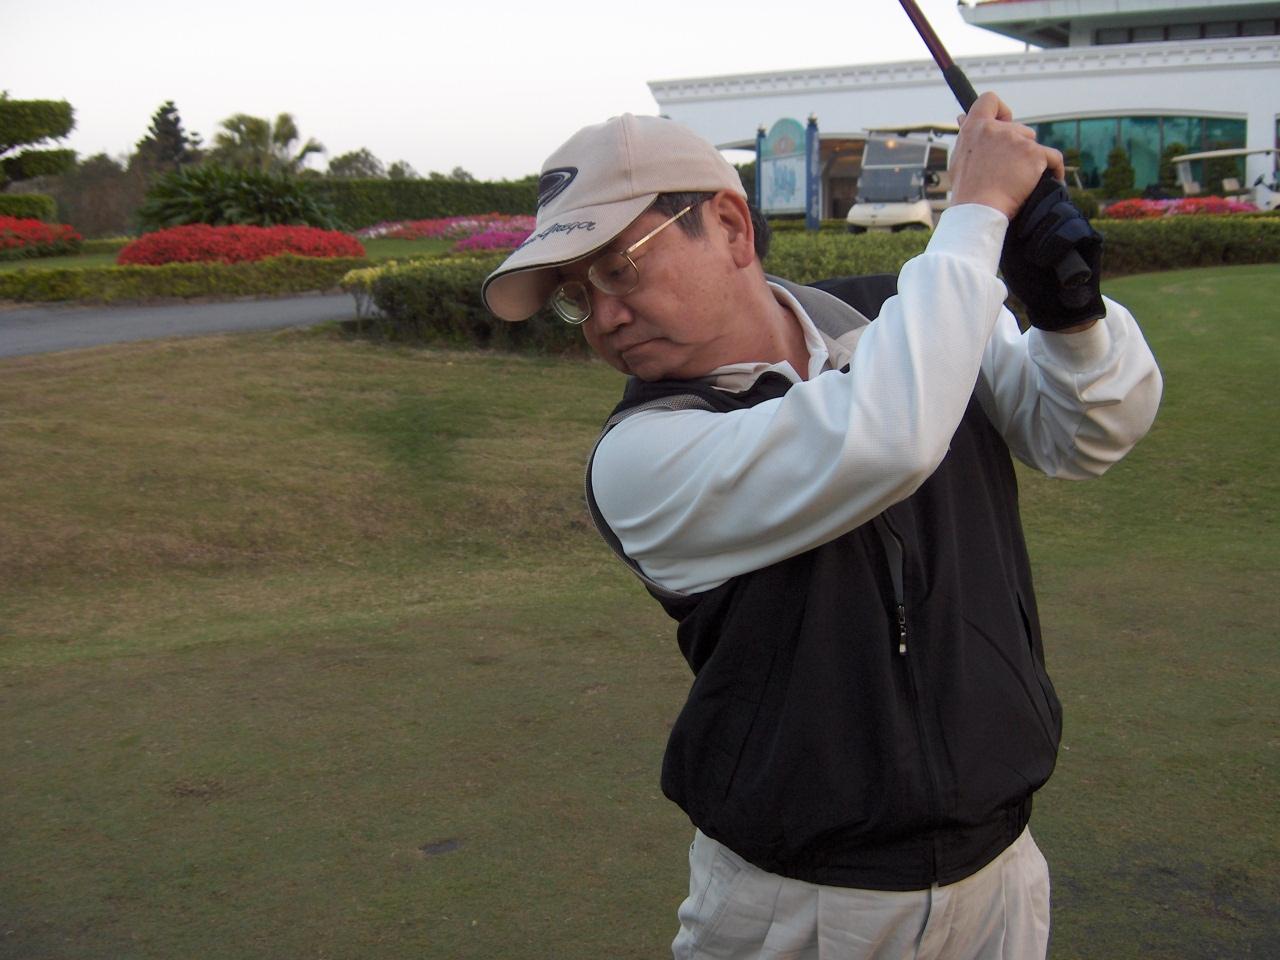 CTGA-Chinese Tempered Golf Association千錘百鍊高爾夫協會: 千錘百鍊高爾夫球研究中心 - 短桿的探討